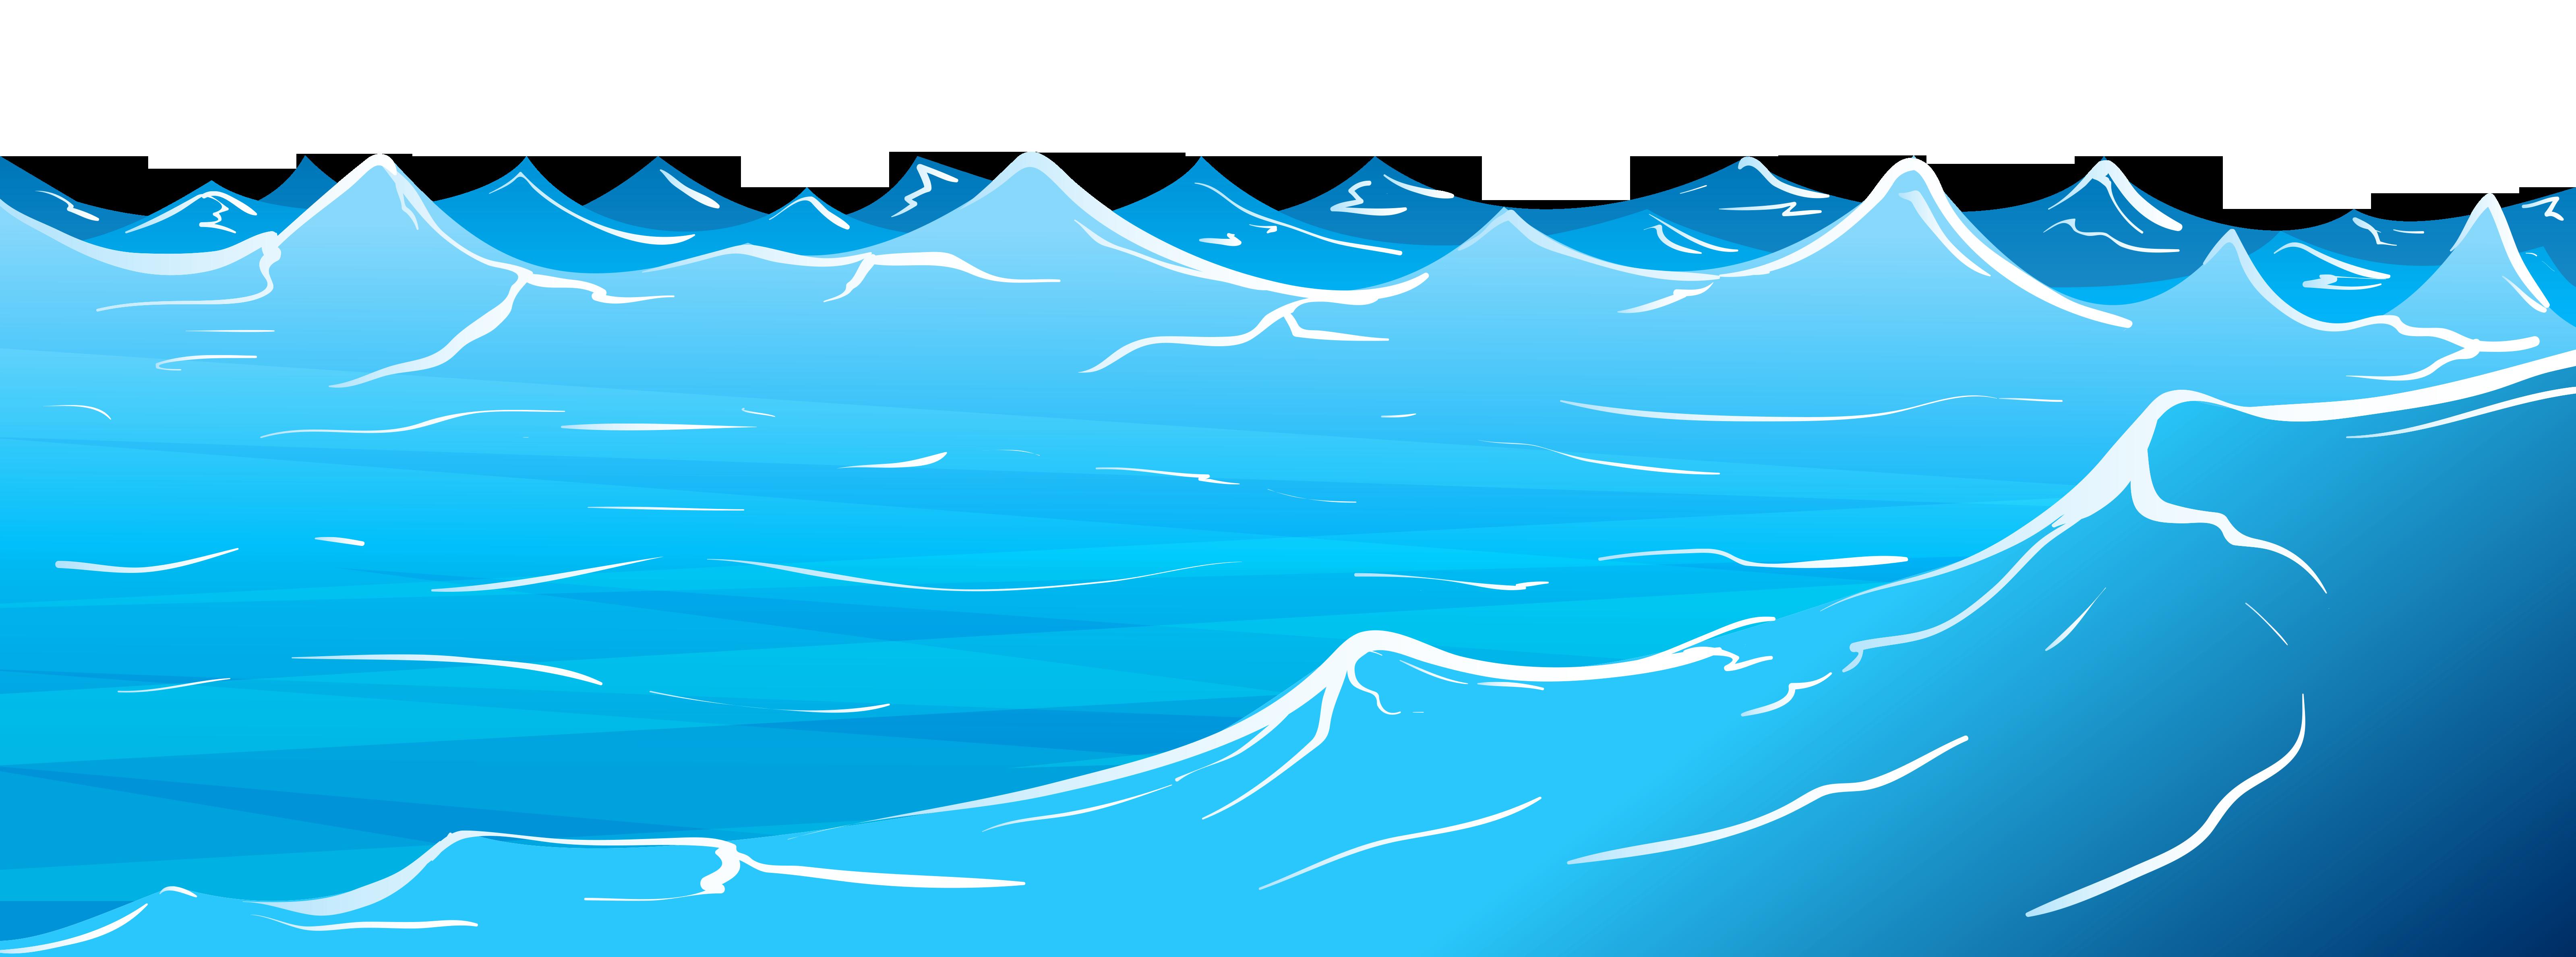 Wave Illustration Google Search Ocean Clipart Sea Pictures Clip Art